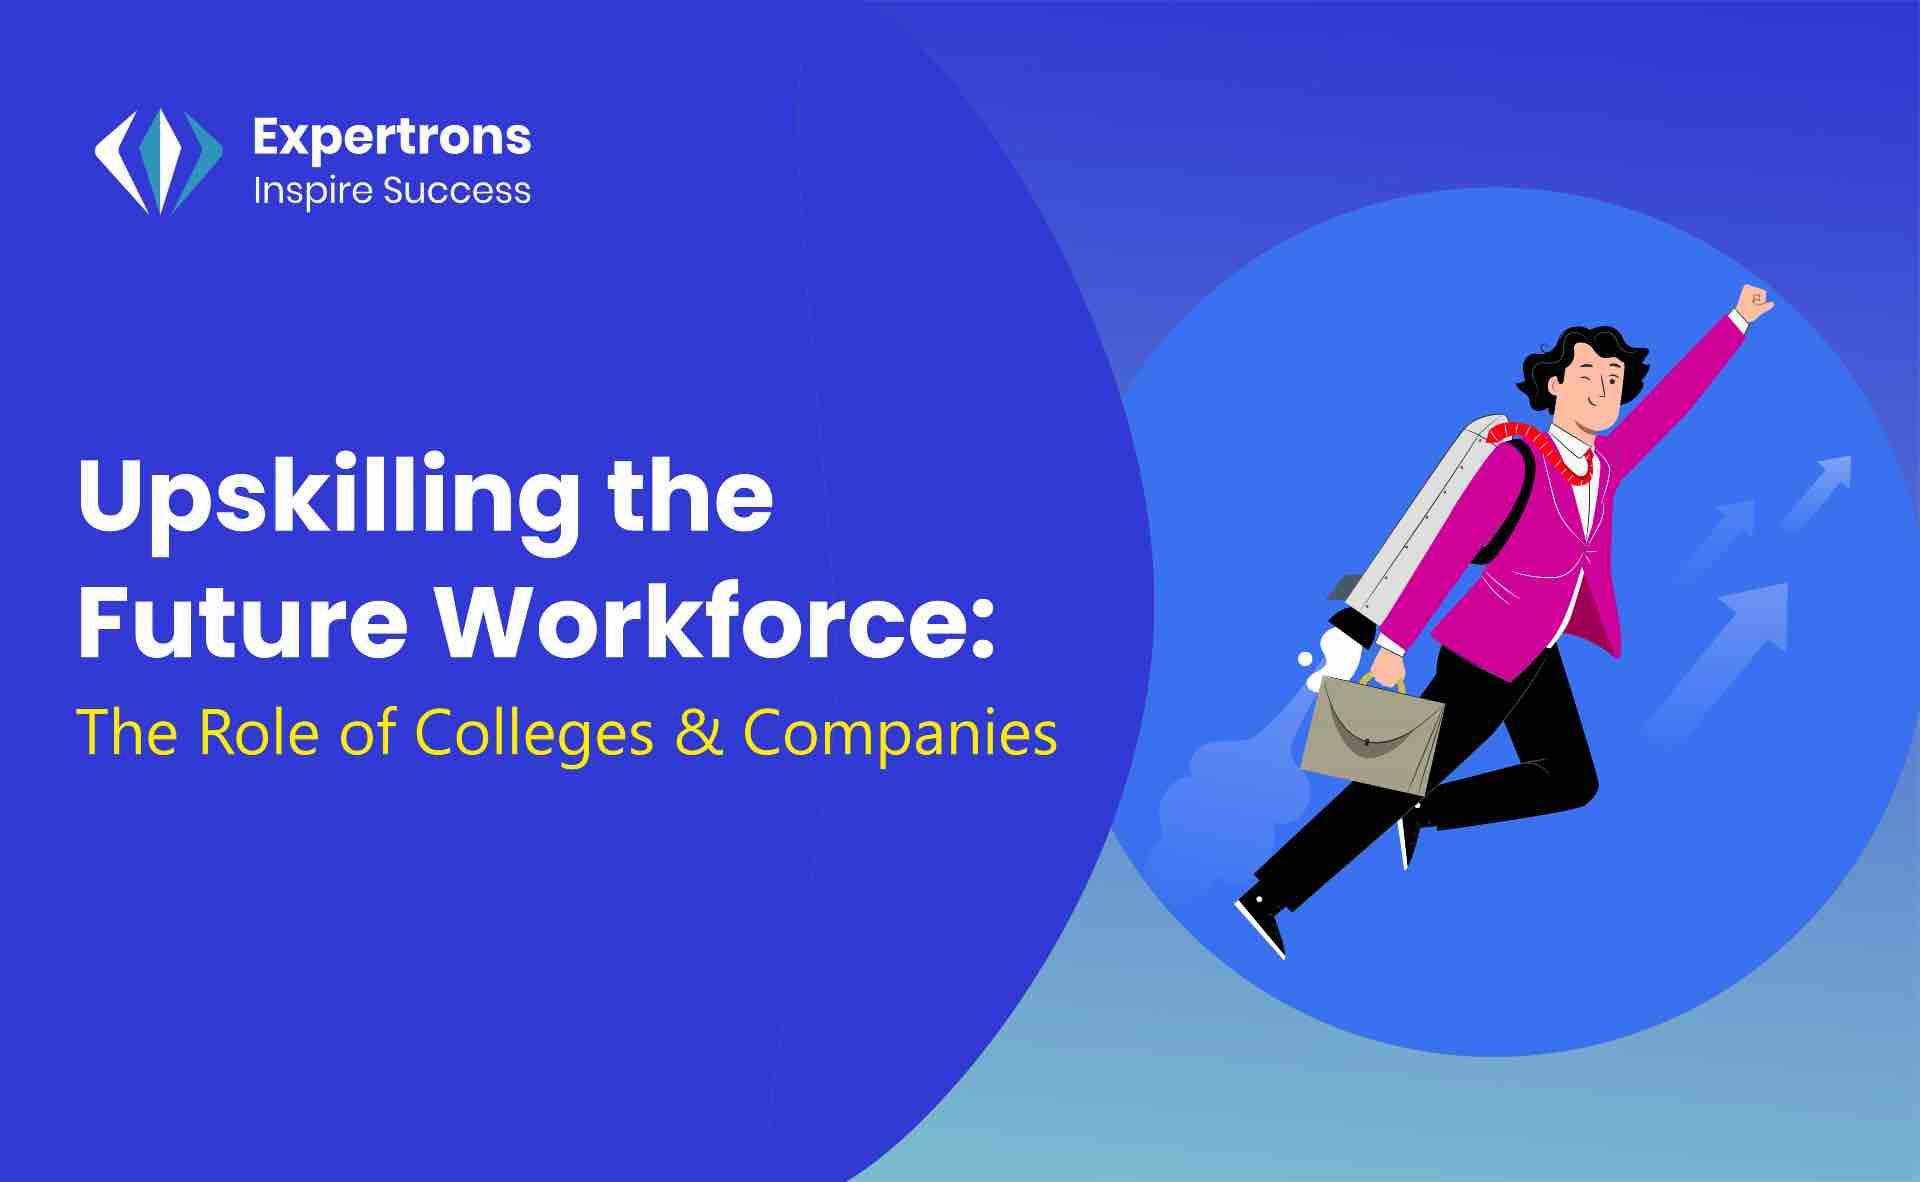 "career counselling online, career guidance, career hacks, free career counselling, placment startegies, professional development skills, team building skills, upskilling the workforce"""